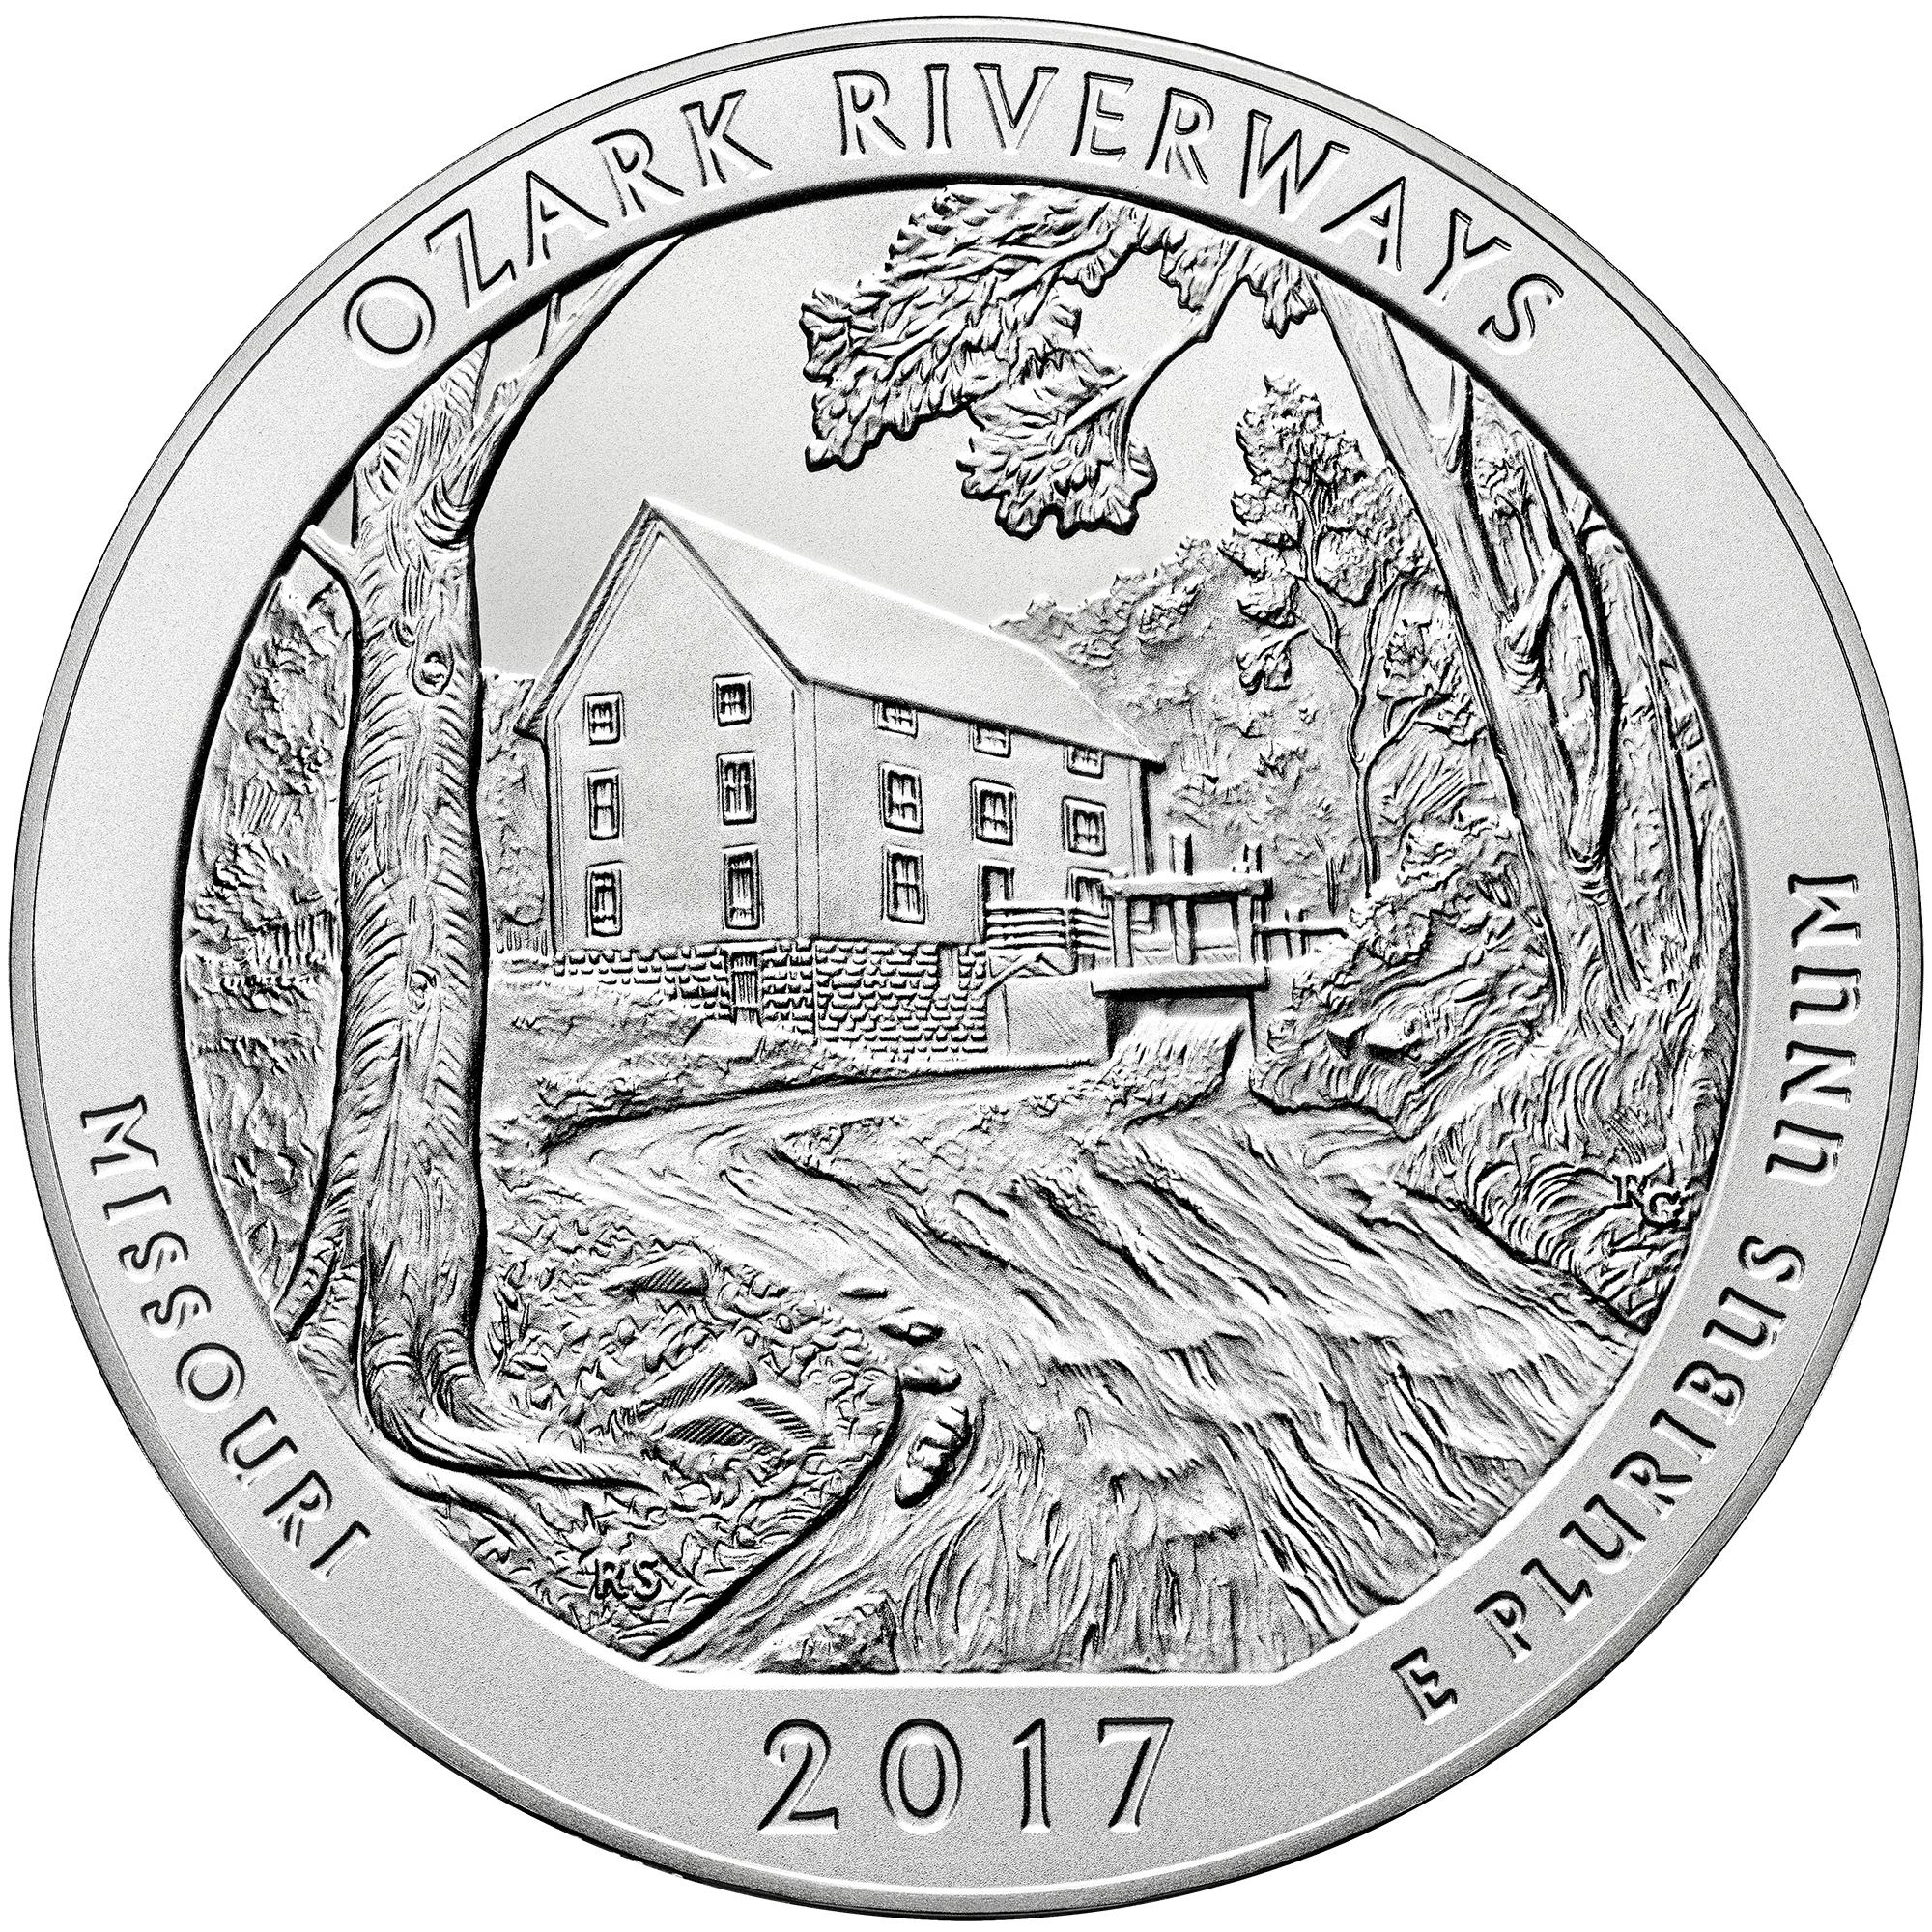 2017 America the Beautiful Quarters Five Ounce Silver Uncirculated Coin Ozark Riverways Missouri Reverse